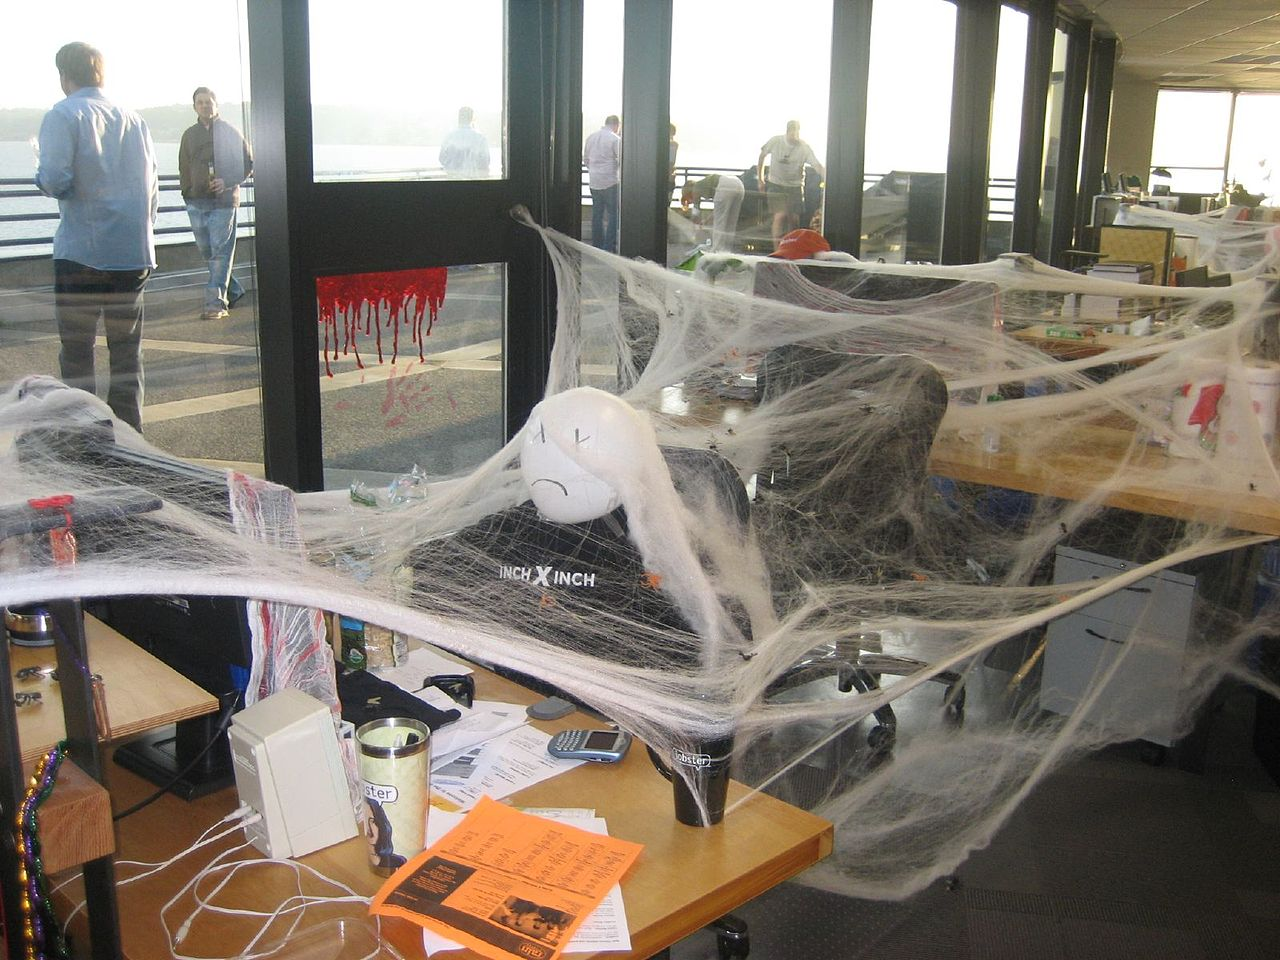 Halloween desk prank